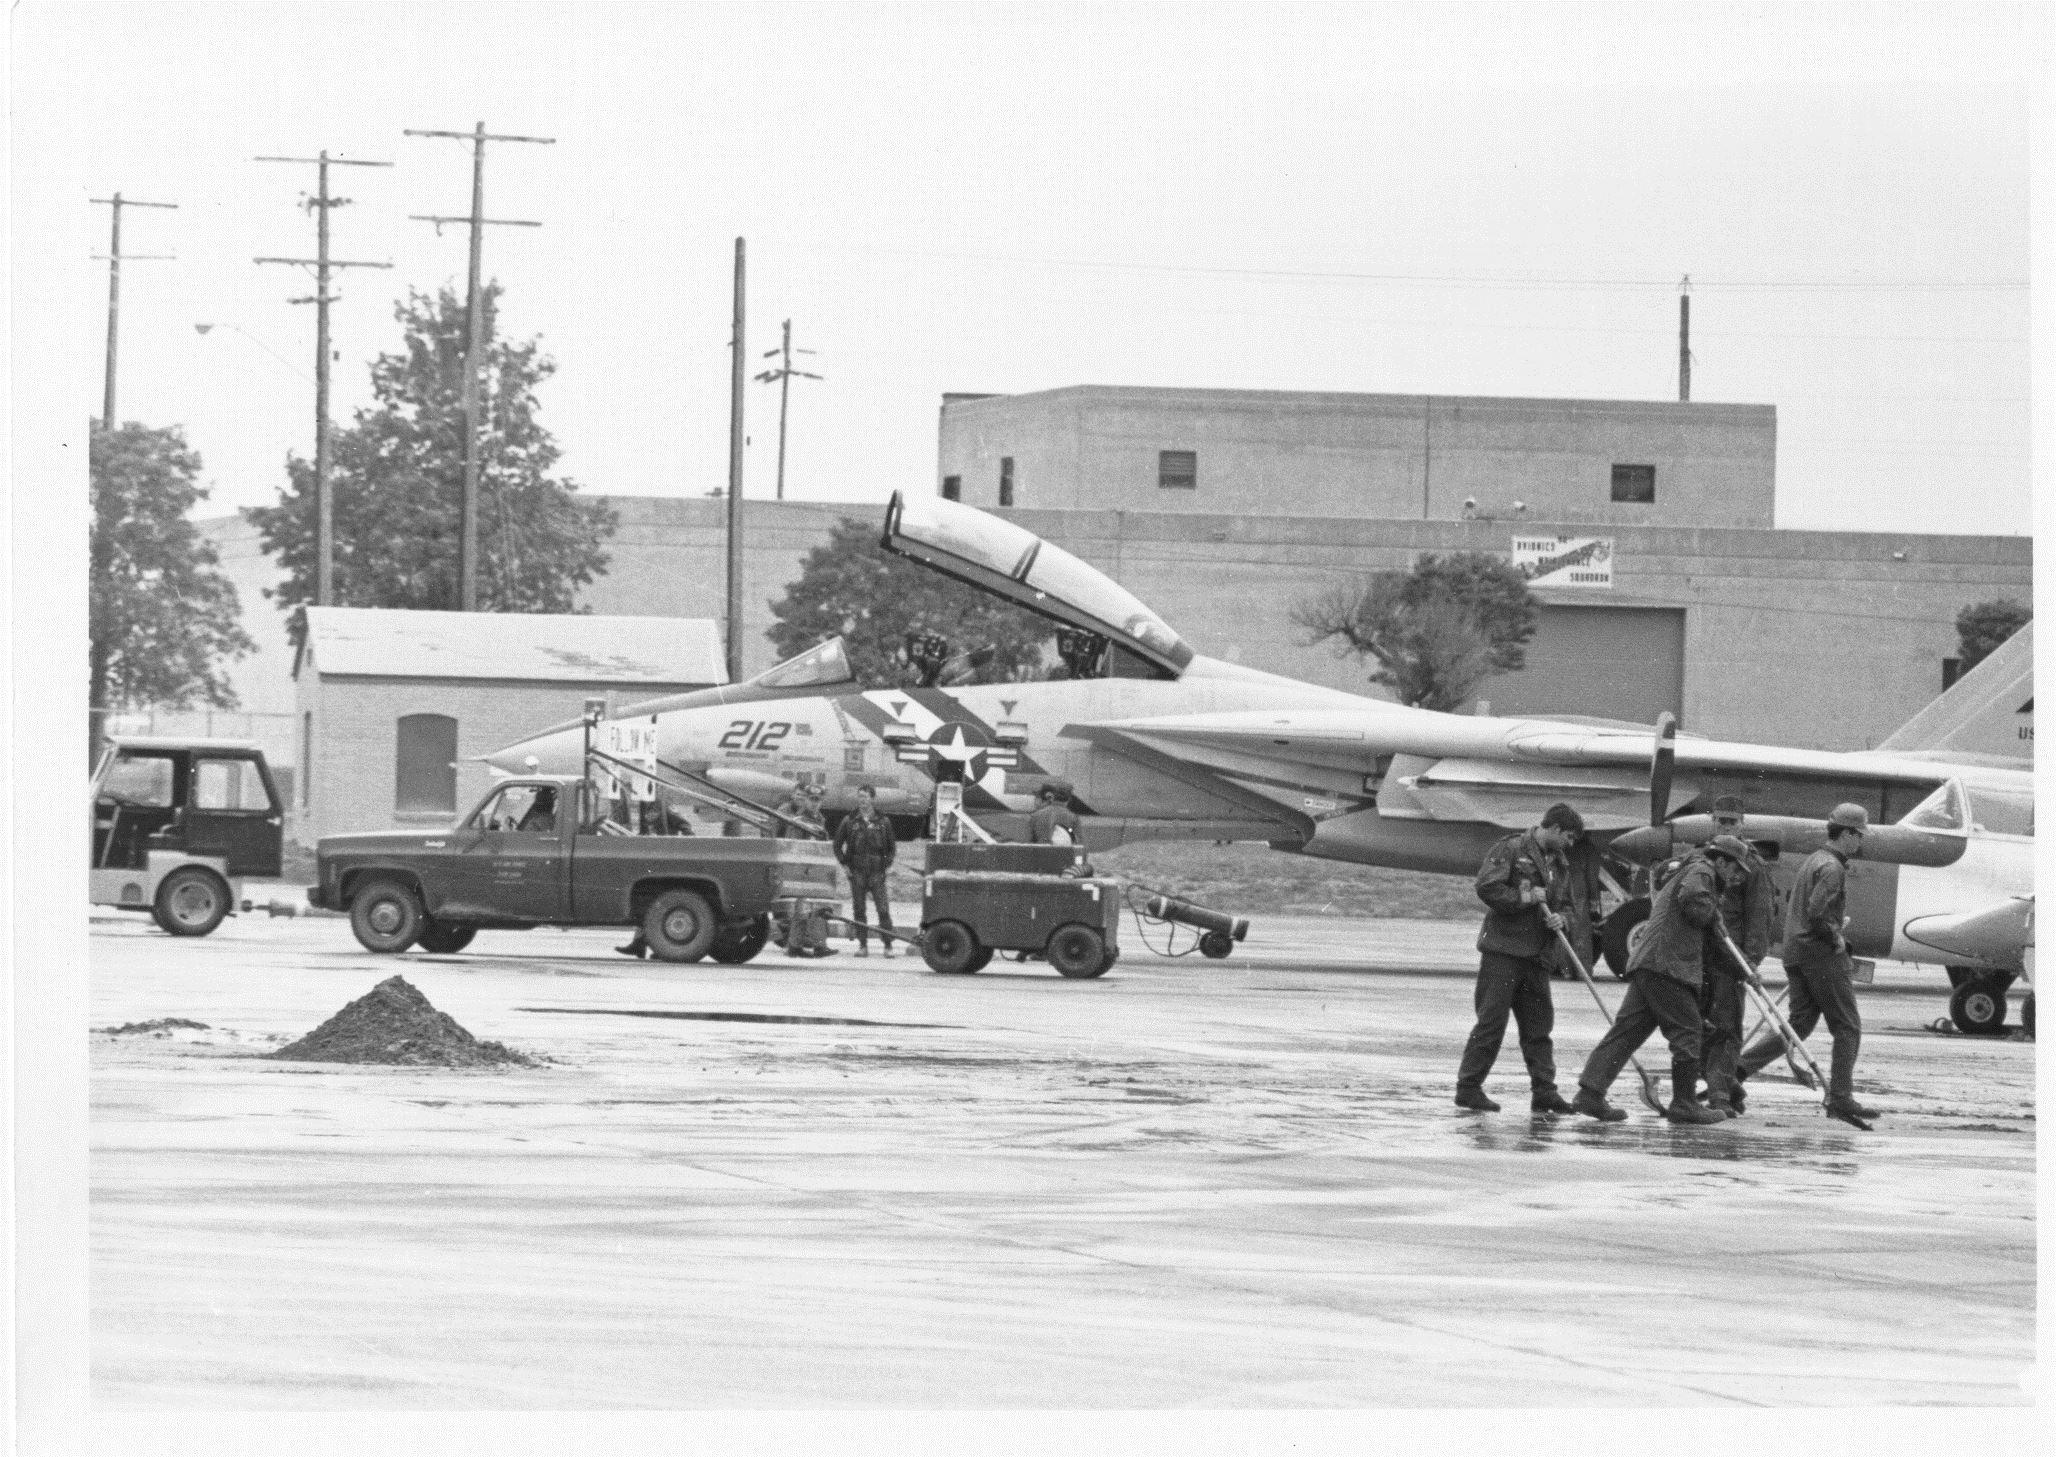 Who Shot J.R.? > Fairchild Air Force Base > Display